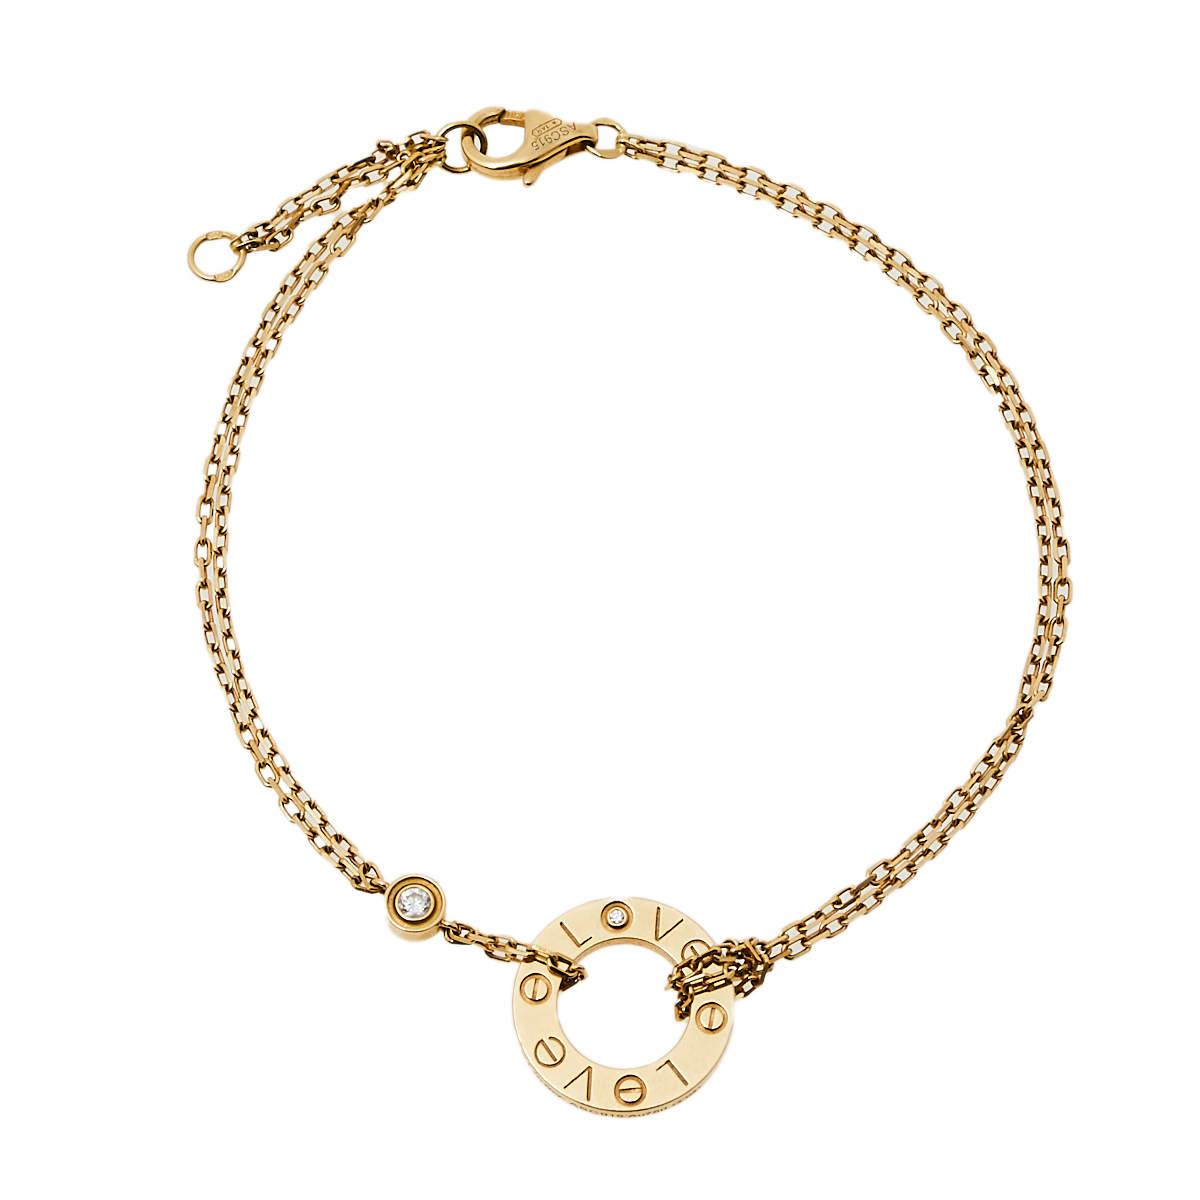 Cartier Love Diamond 18K Yellow Gold Double Chain Bracelet